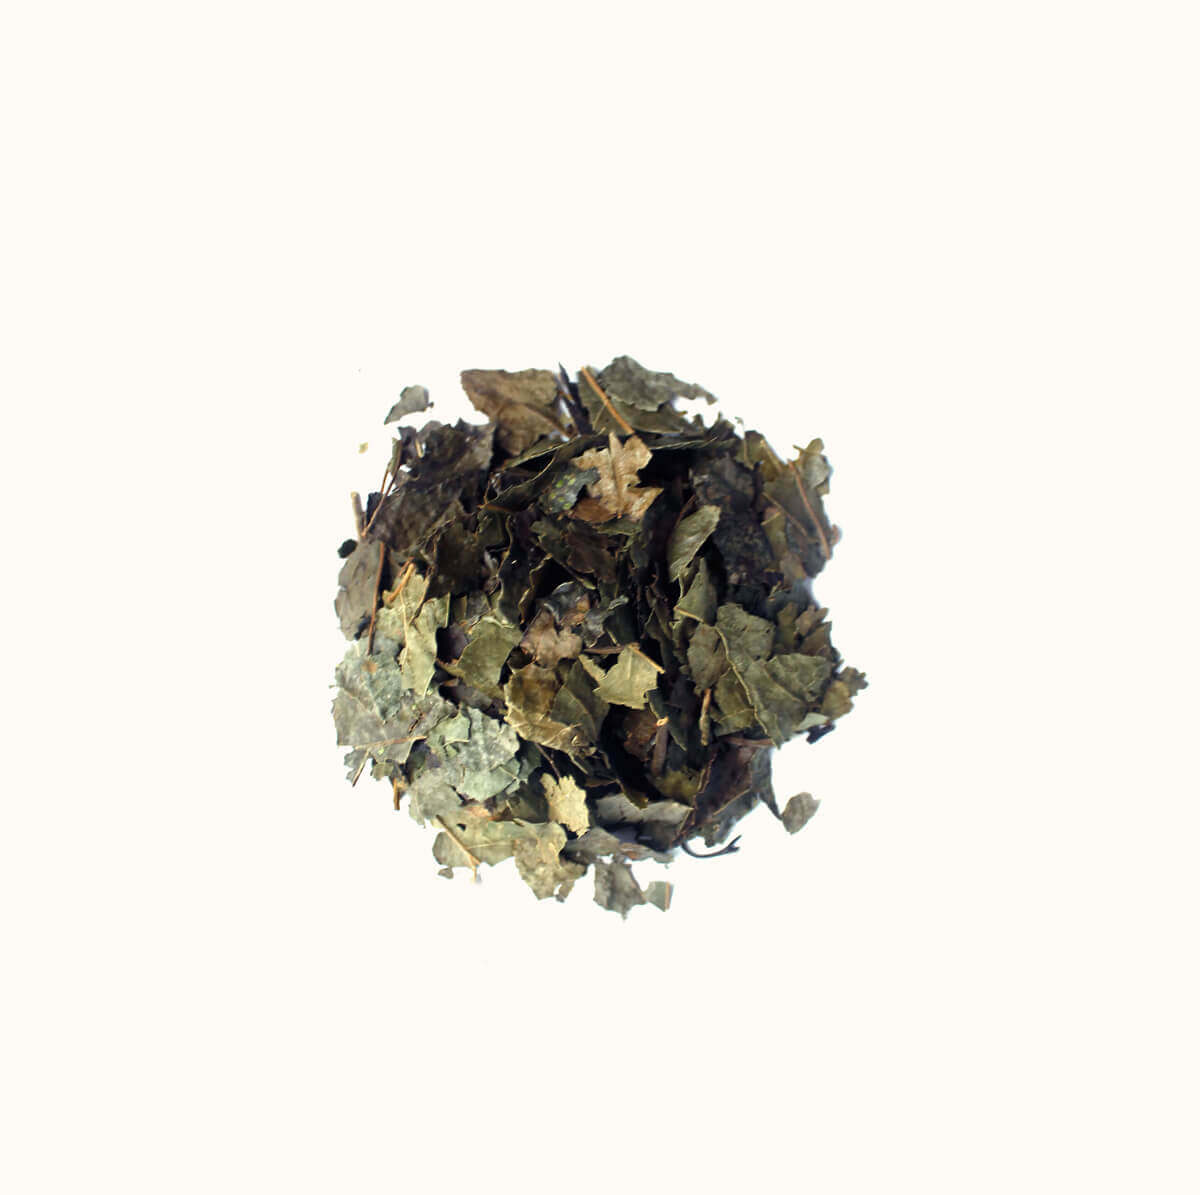 PORANGABA - Cordia salicifolia - 30g